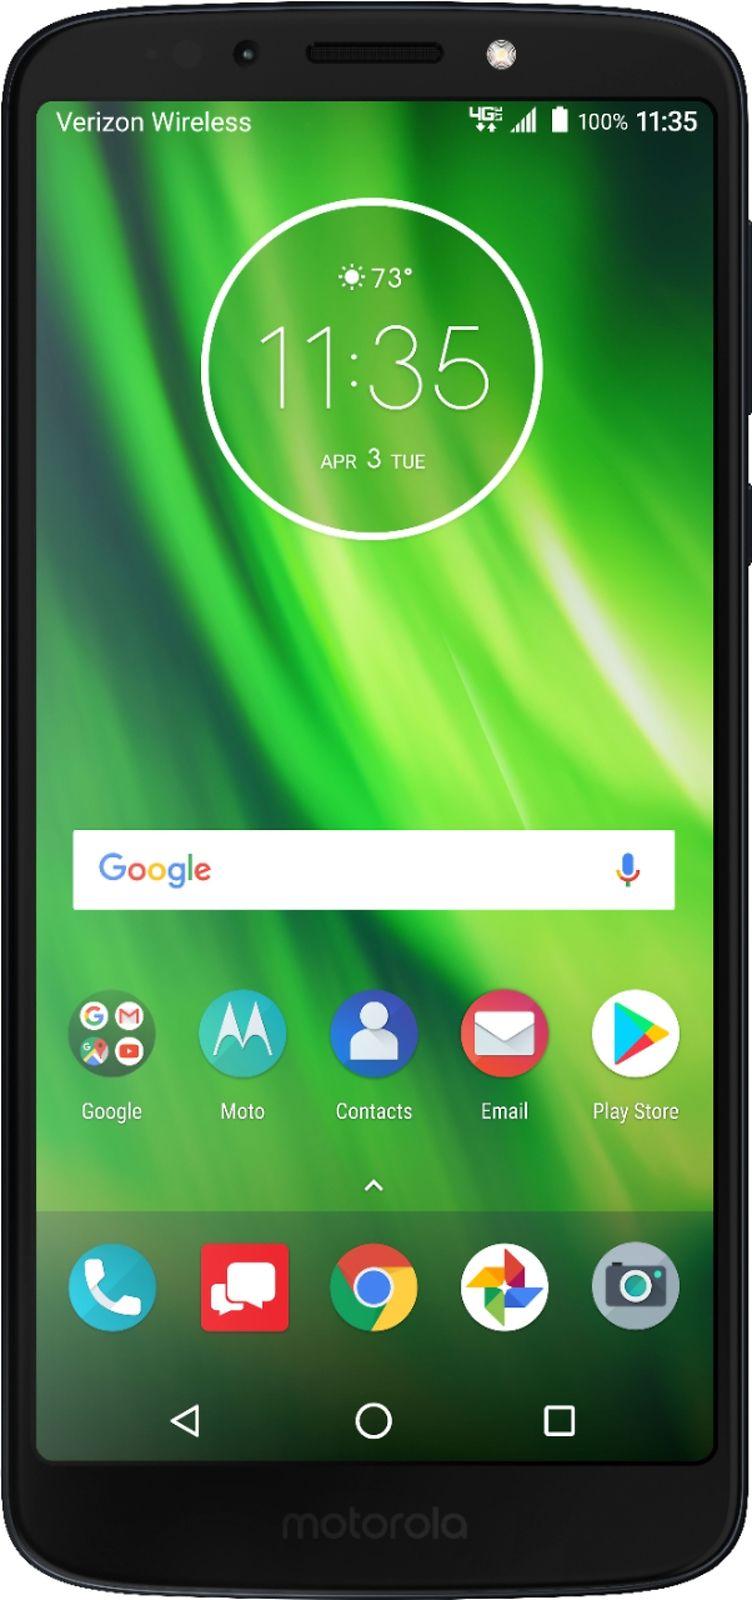 Verizon Prepaid - Moto G6 Play with 16GB Memory Prepaid Cell Phone - Deep Indigo $99.99